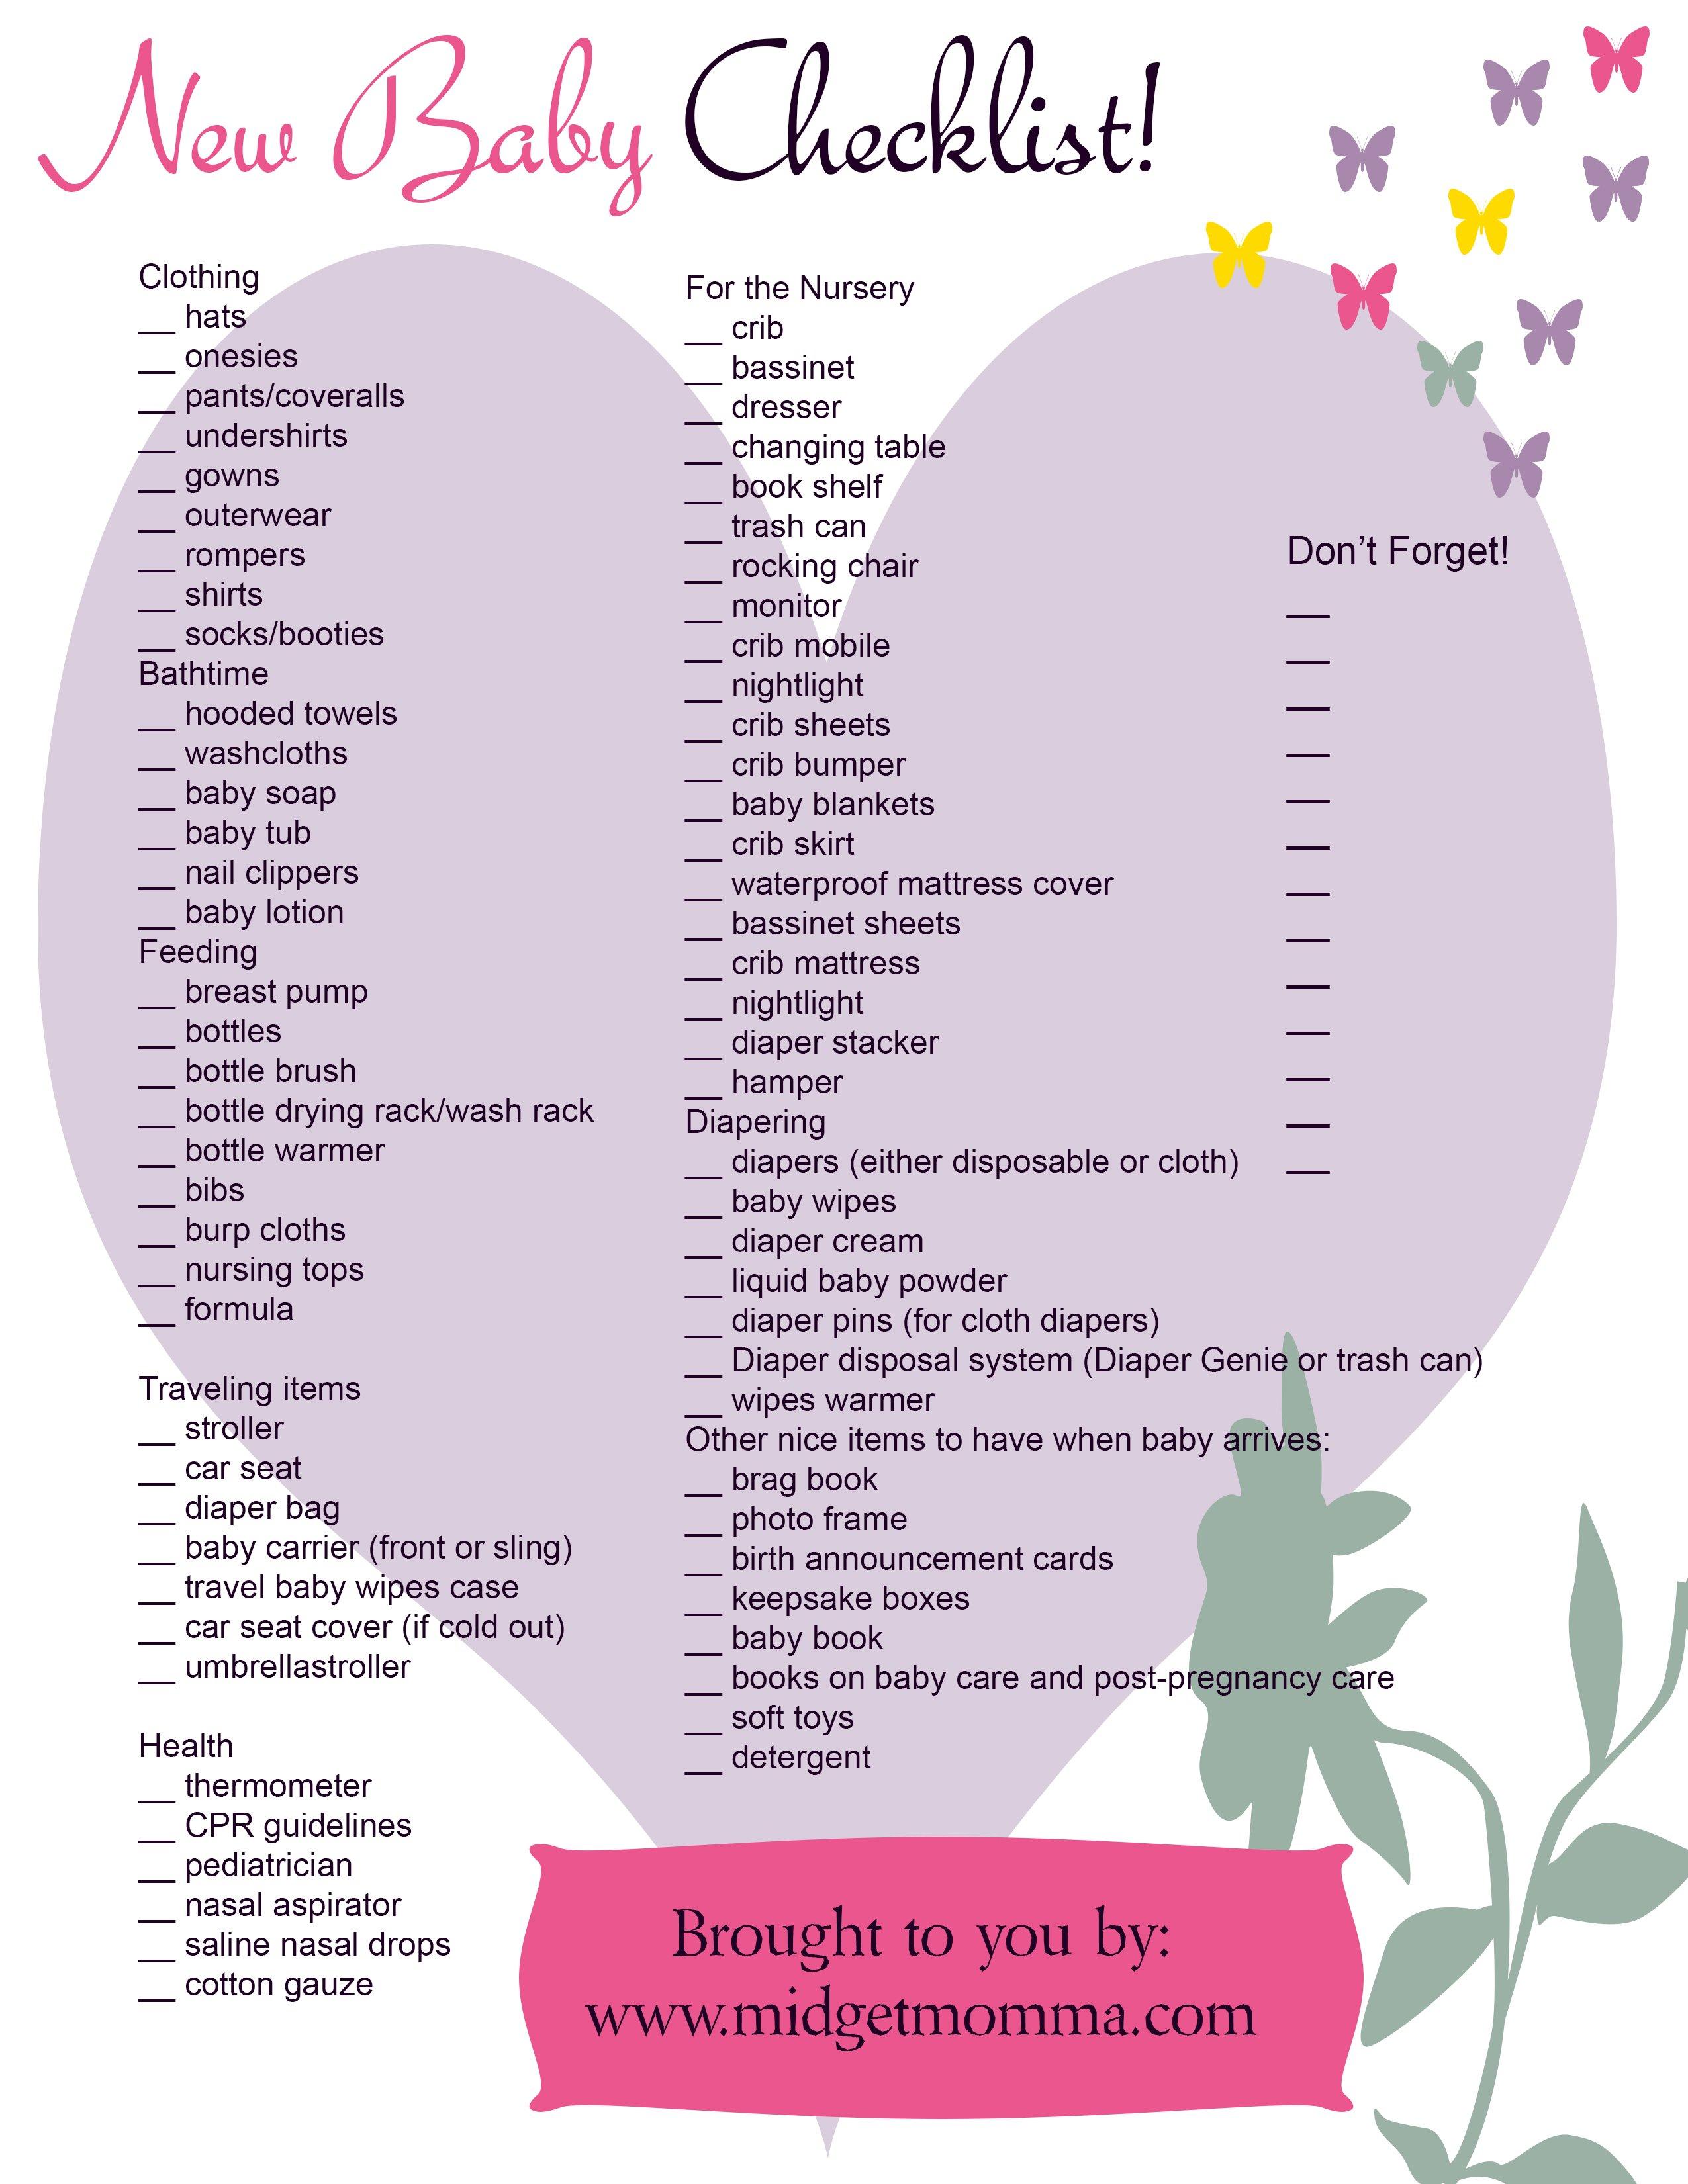 FREE Baby Needs Printable Check list! • MidgetMomma